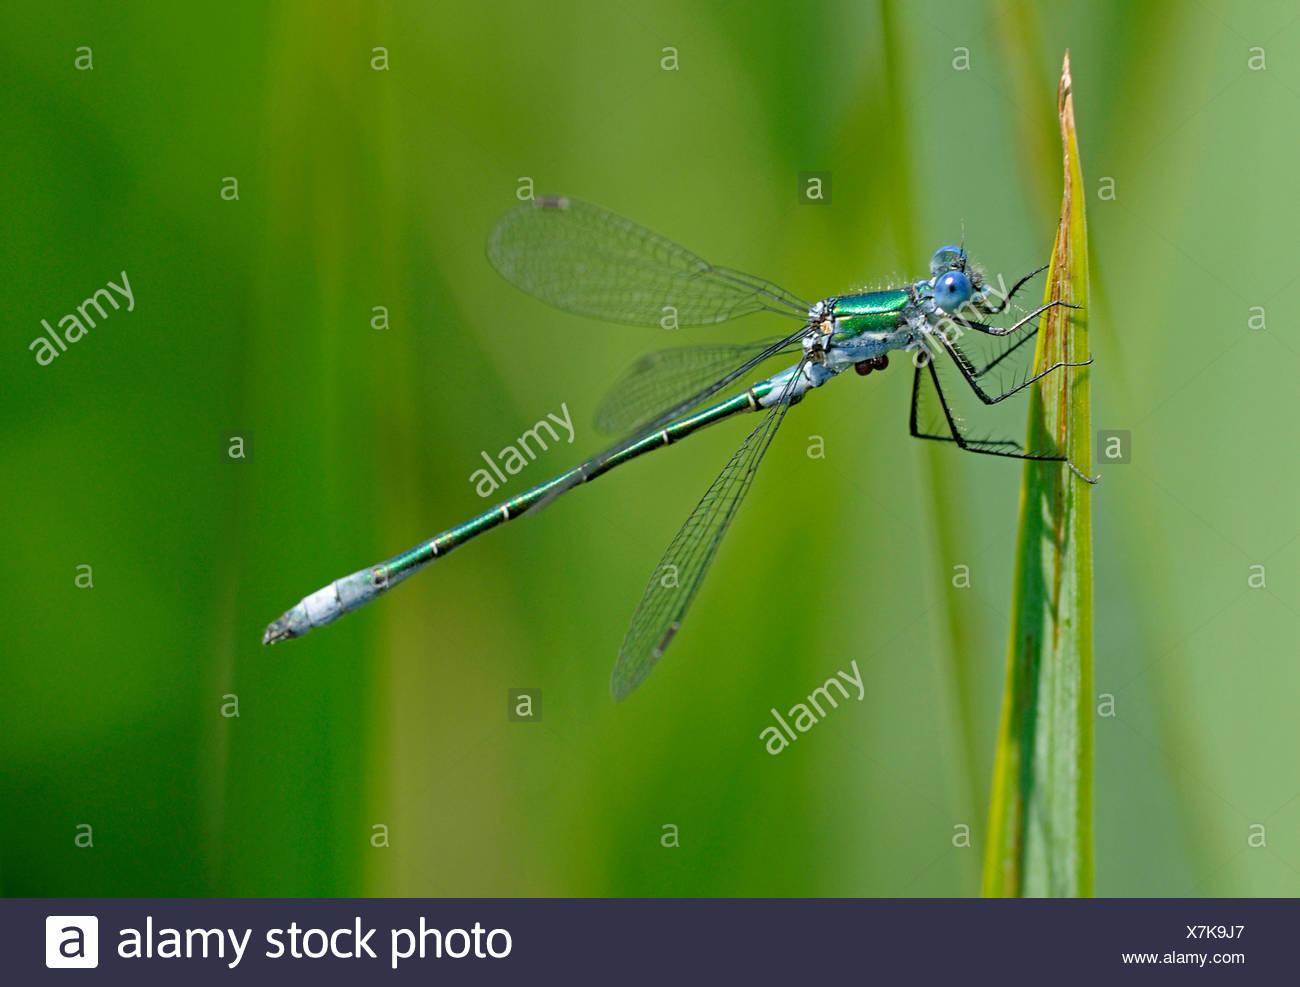 scarce emerald damselfly (Lestes dryas), on blade of grass, Germany - Stock Image